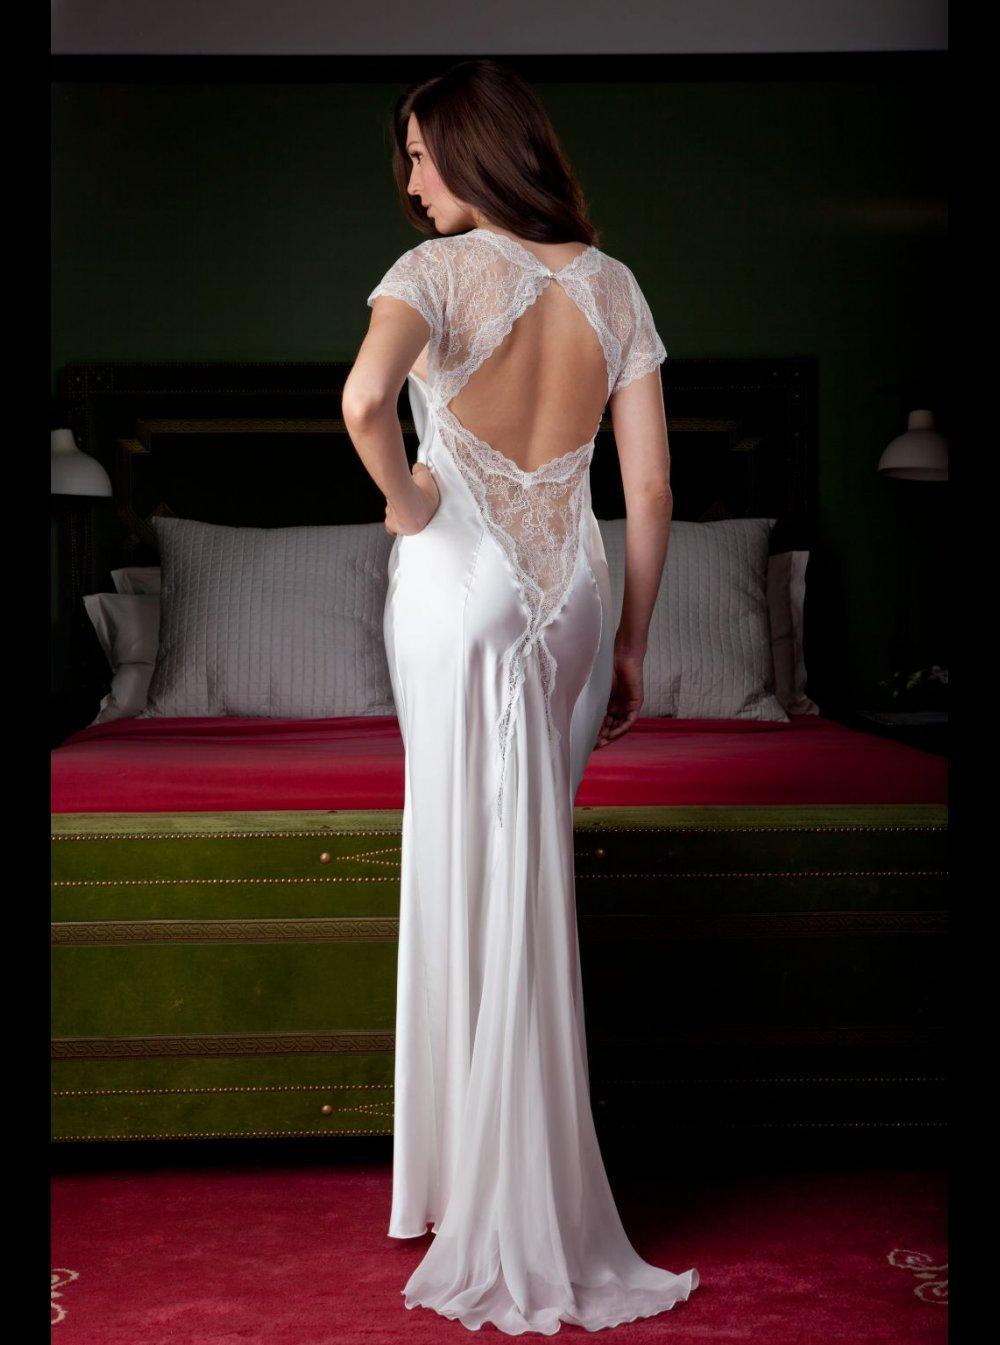 Jane Woolrich Silk Nightdress 8274 Honeys Lingerie